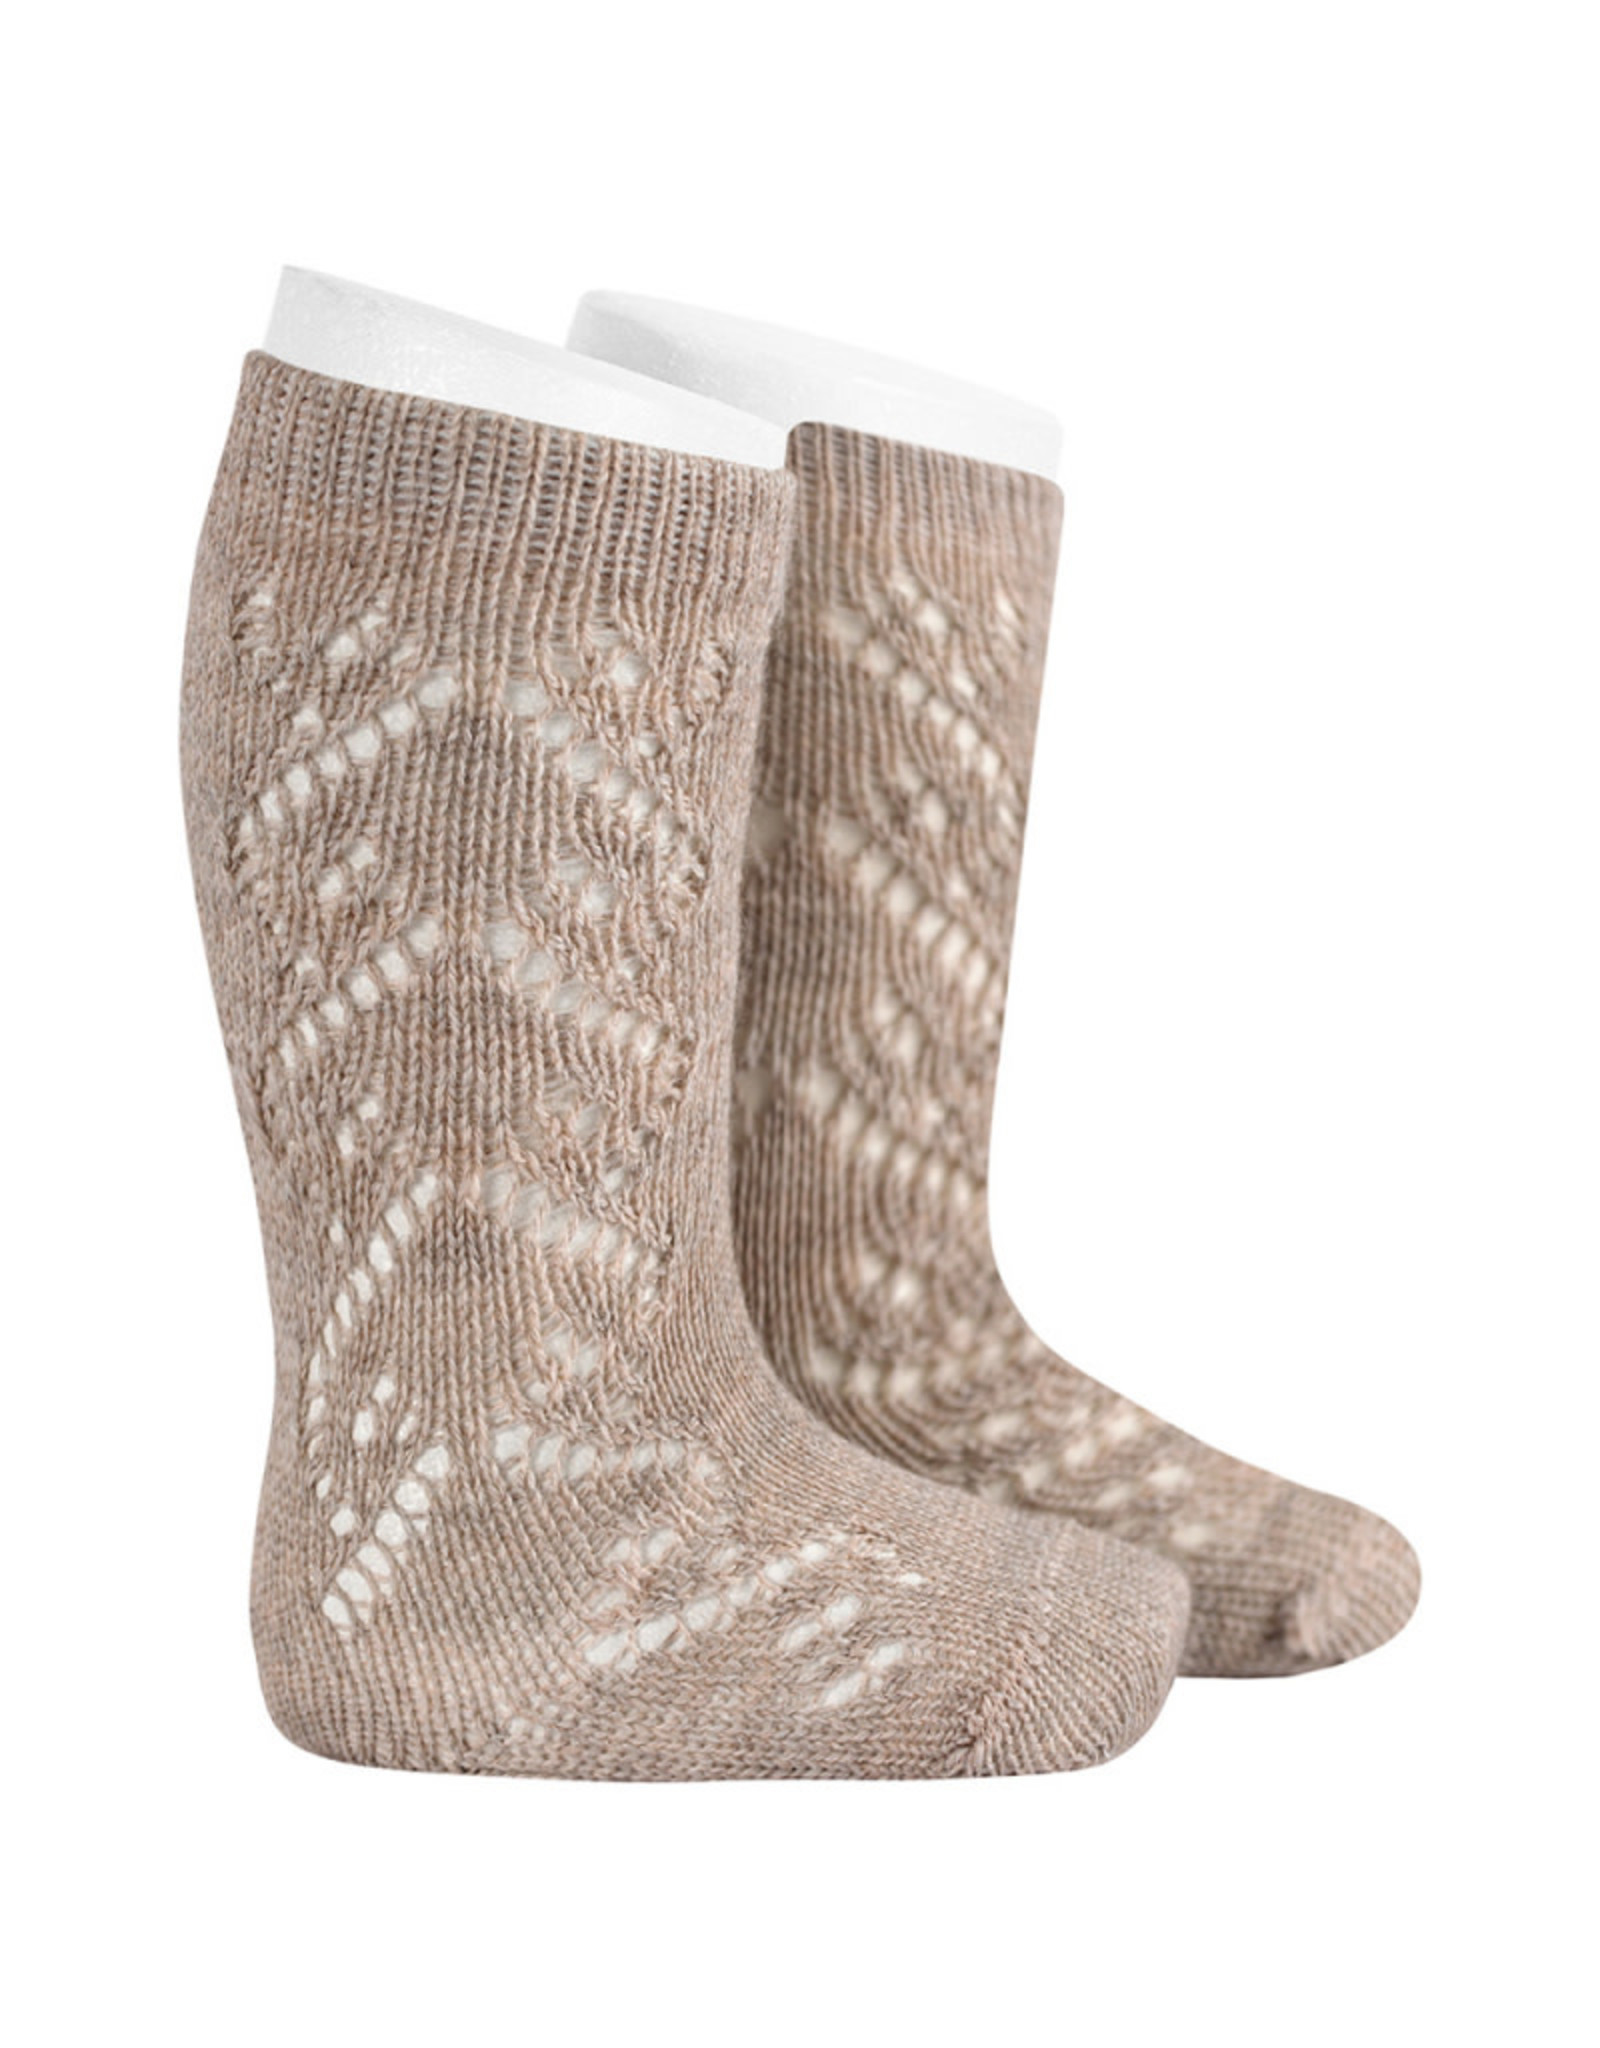 CONDOR Oatmeal Wool Side Openwork Socks